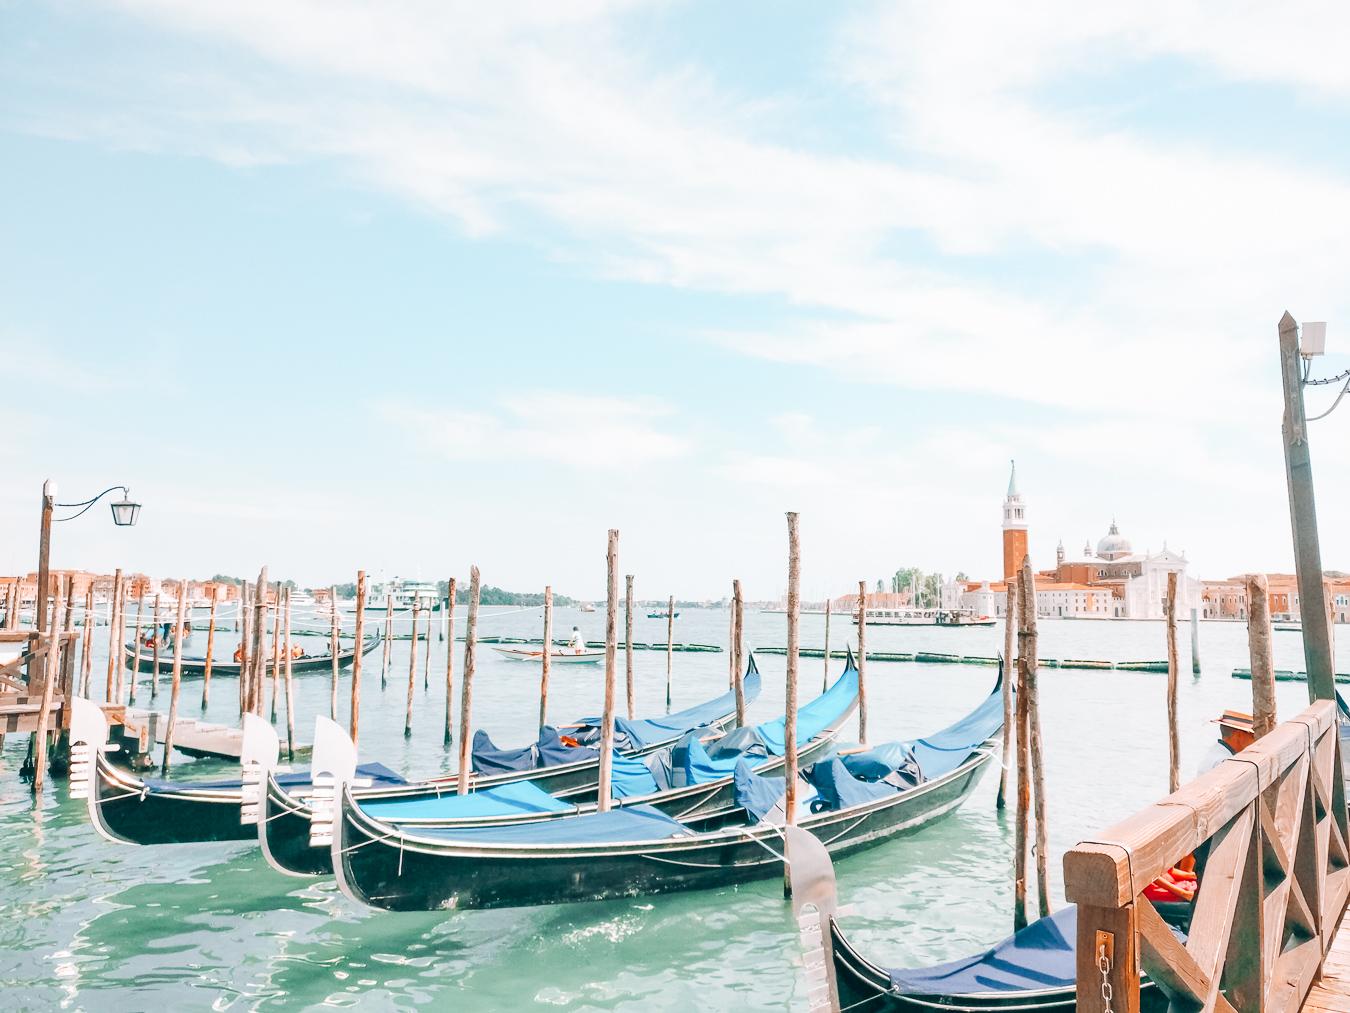 Several gondolas in Venice